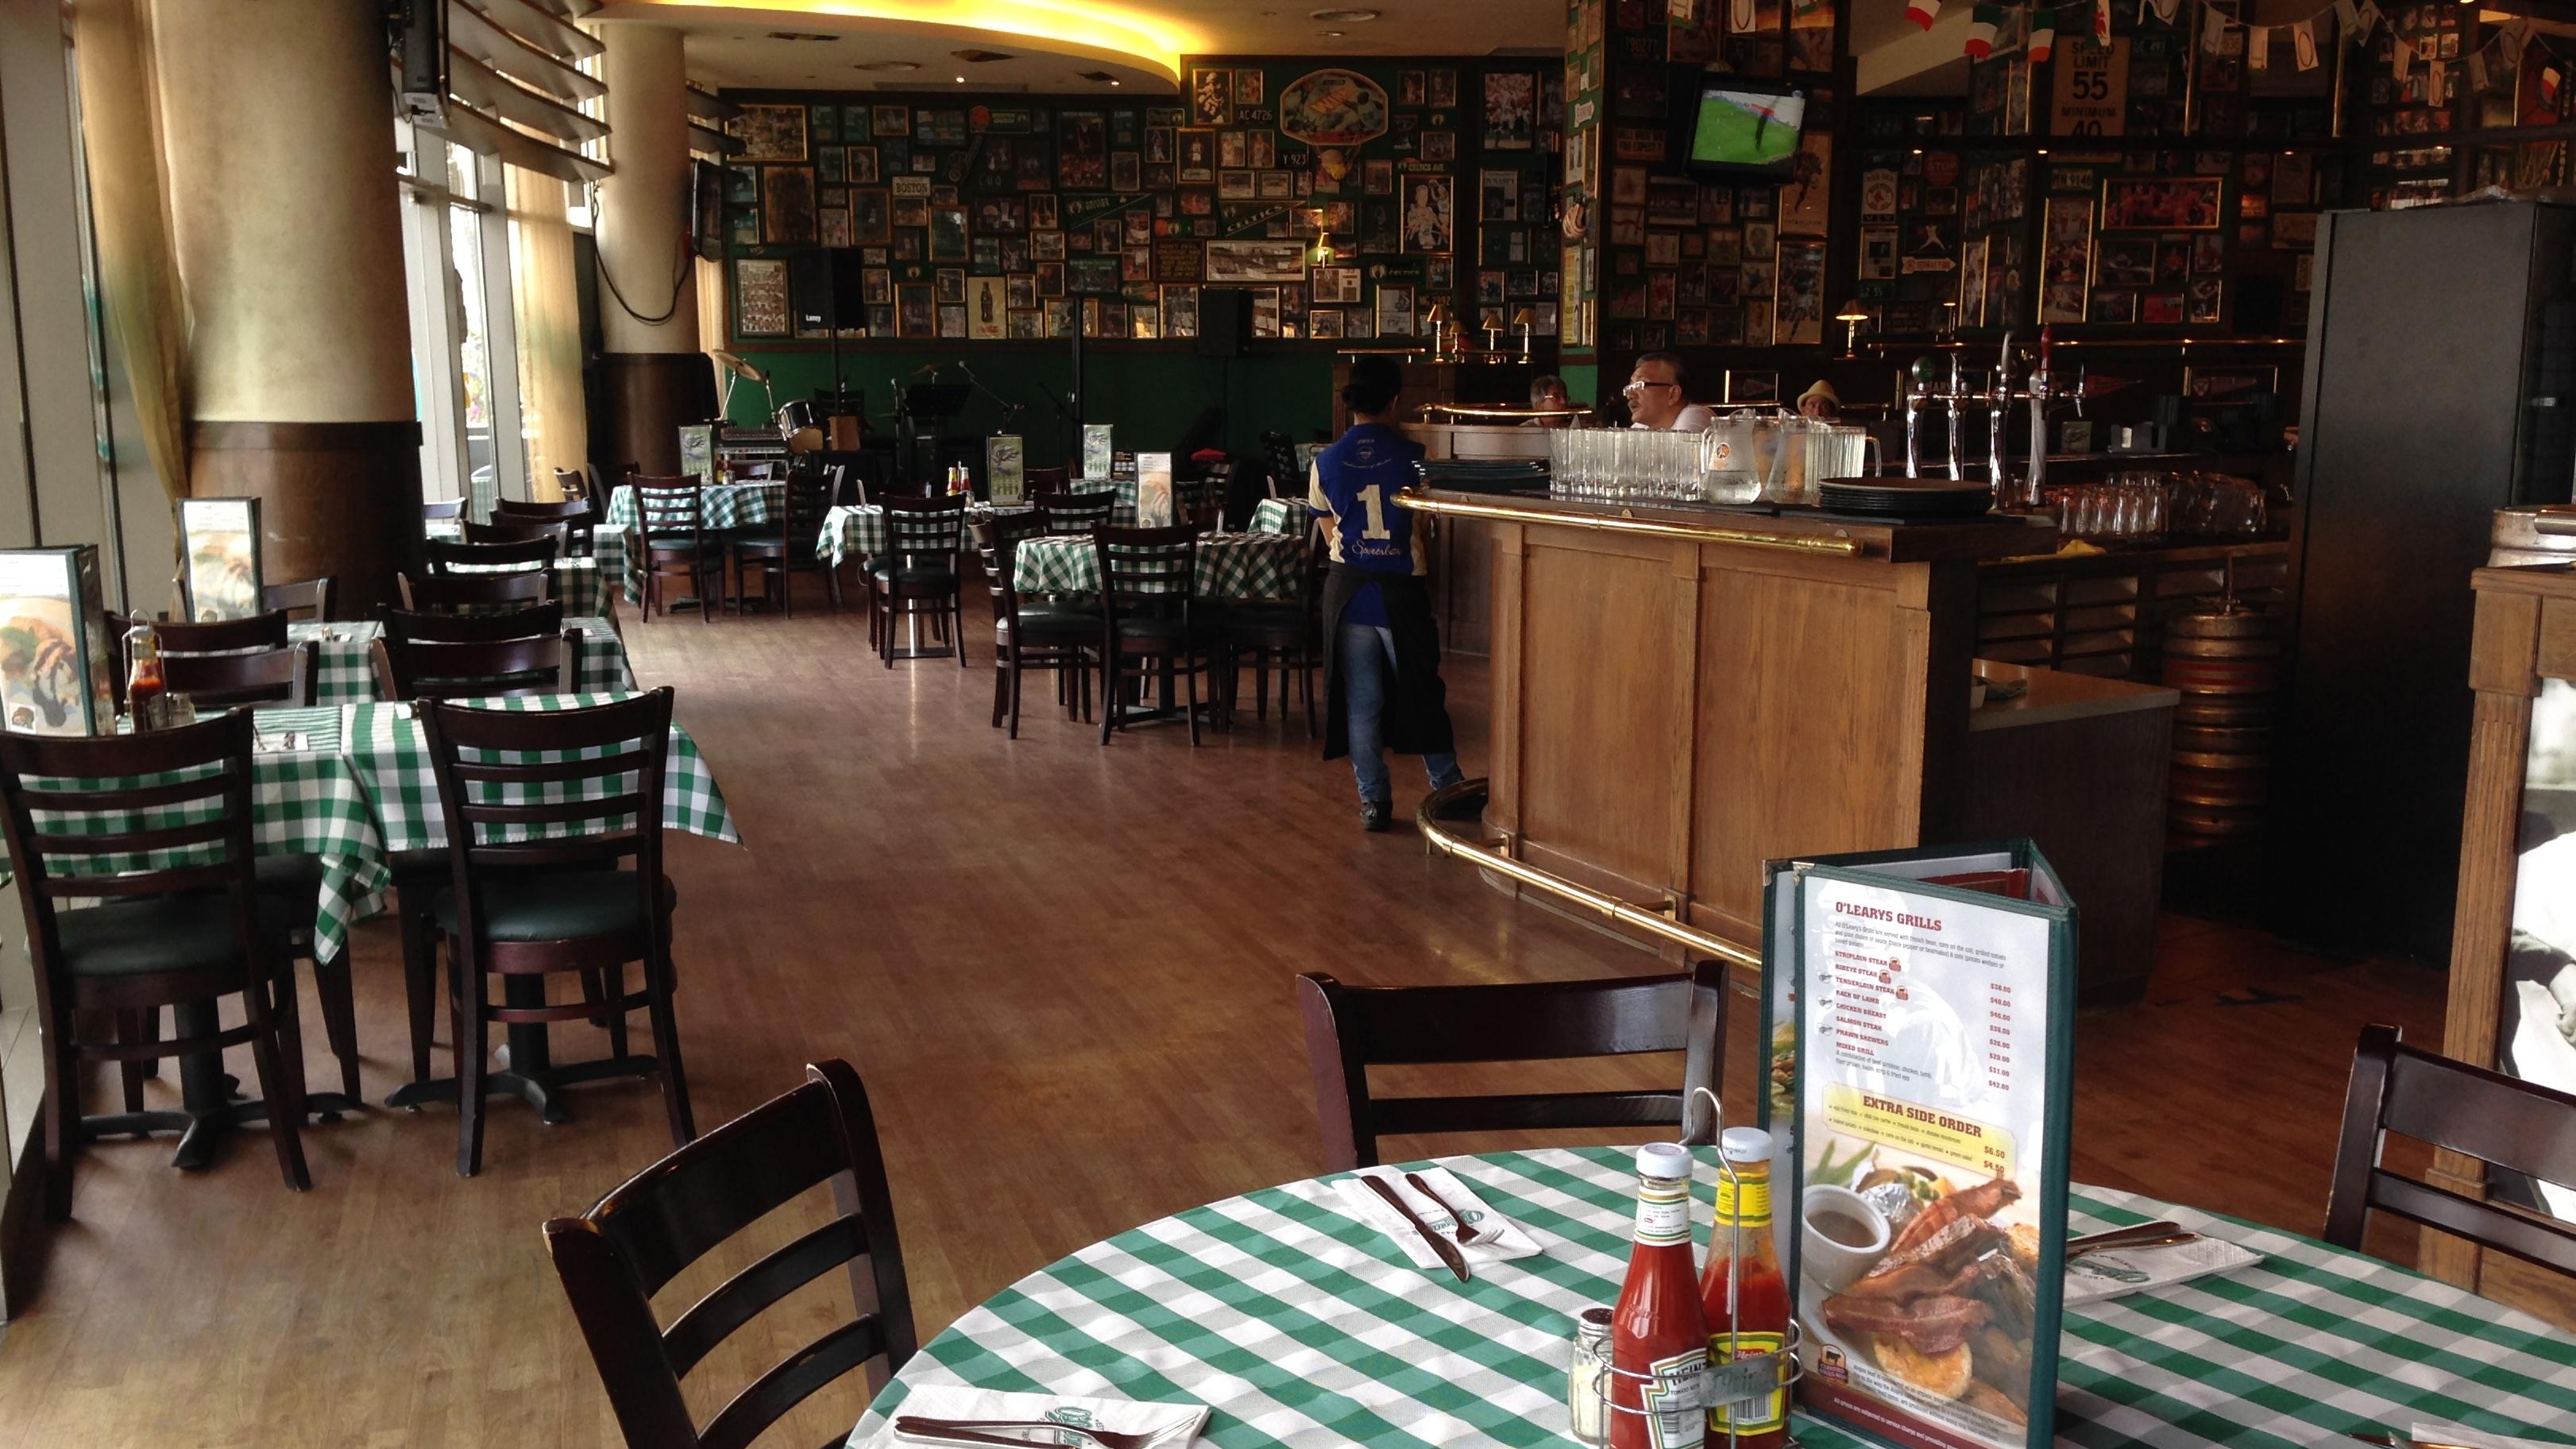 O'Learys Sports Bar & Grill